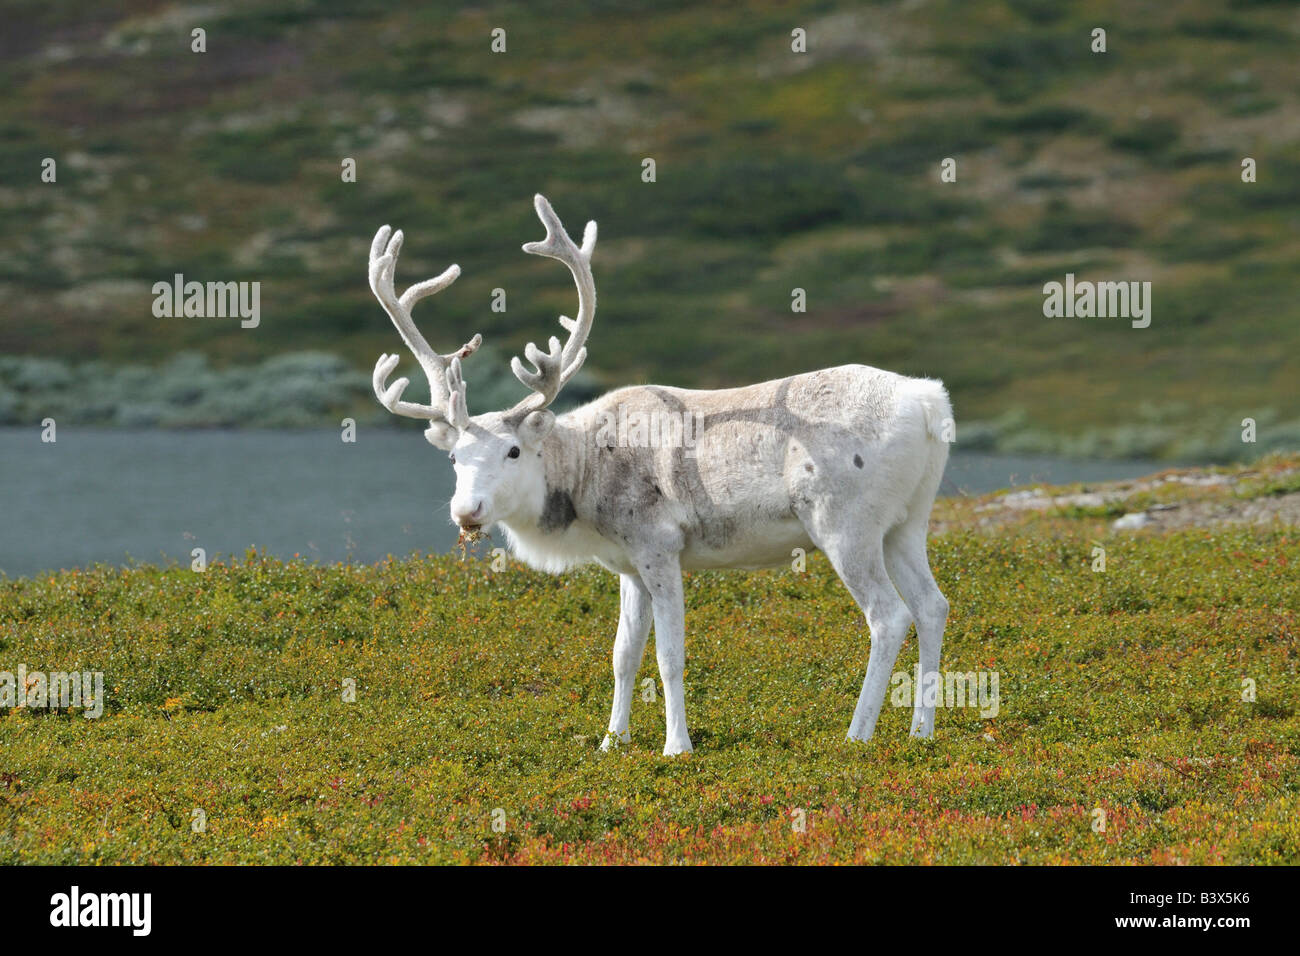 Reindeer (Rangifer tarandus), Dalarna, Sweden - Stock Image